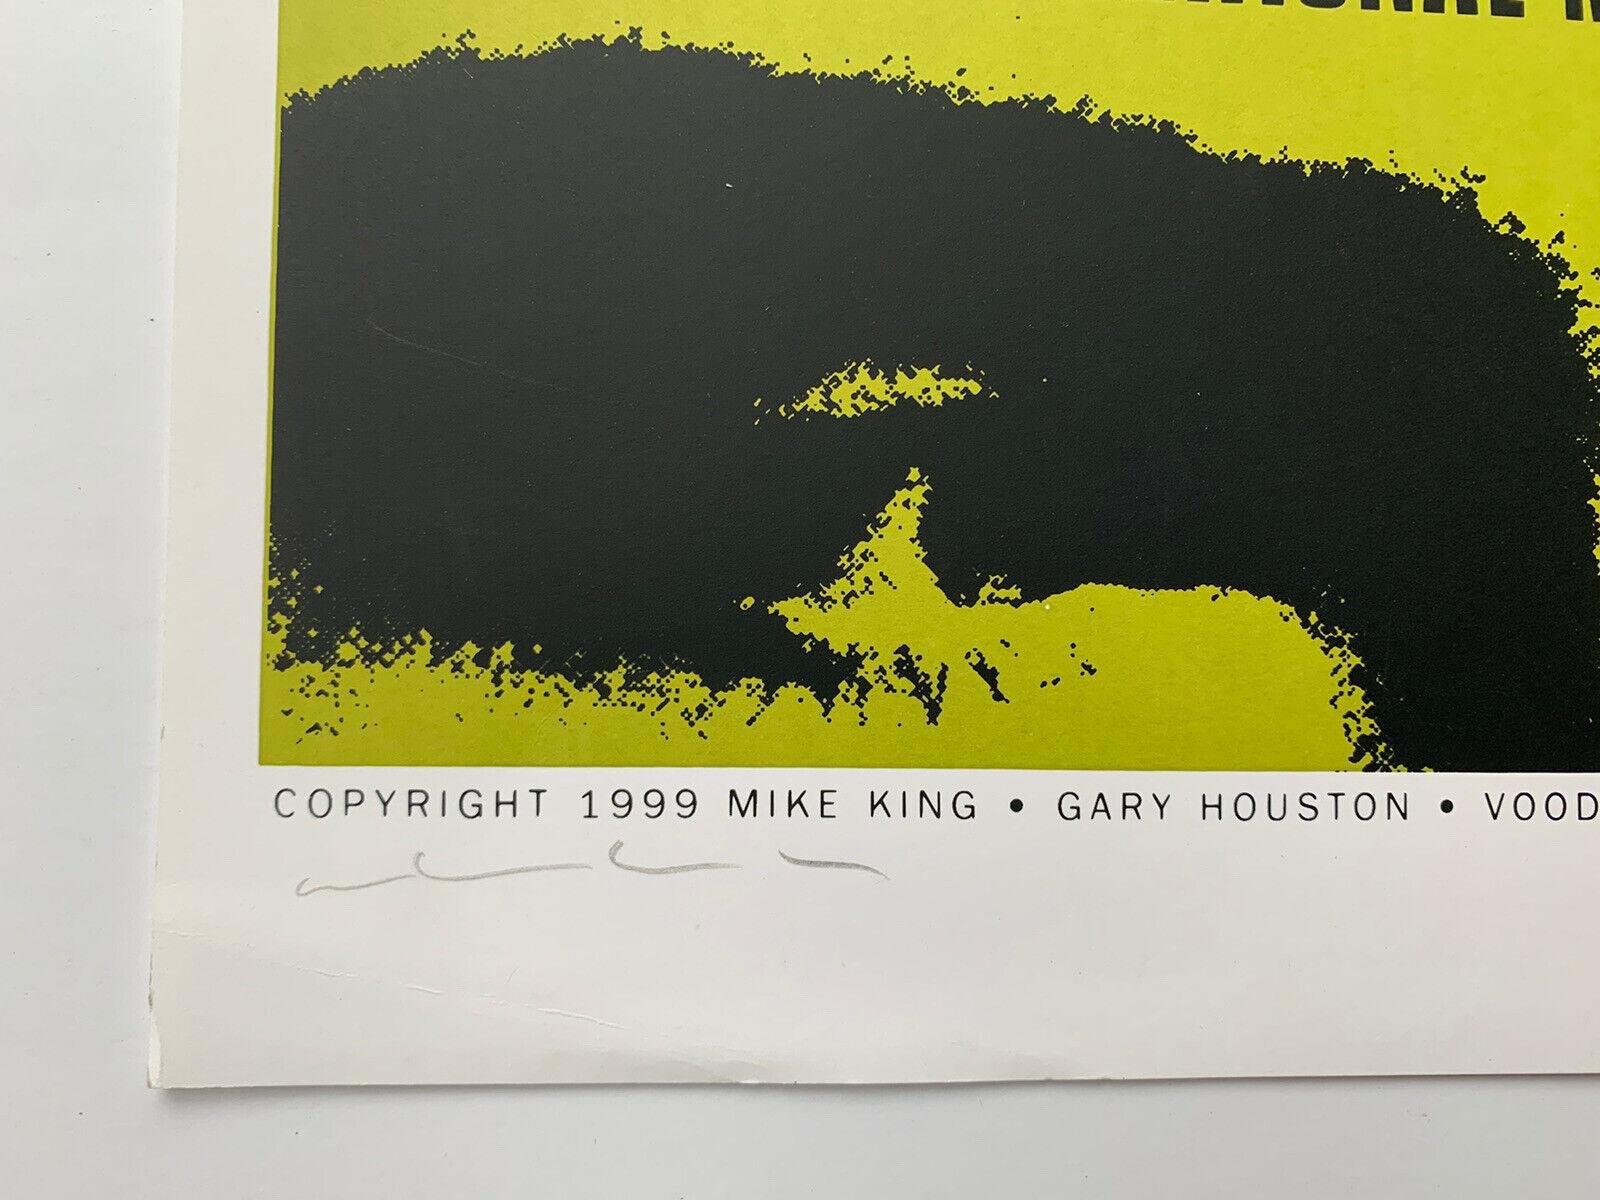 1999 Flaming Lips Sebadoh Mike King Signed Poster 18 X 26 73/130 Gary Houston - $198.00